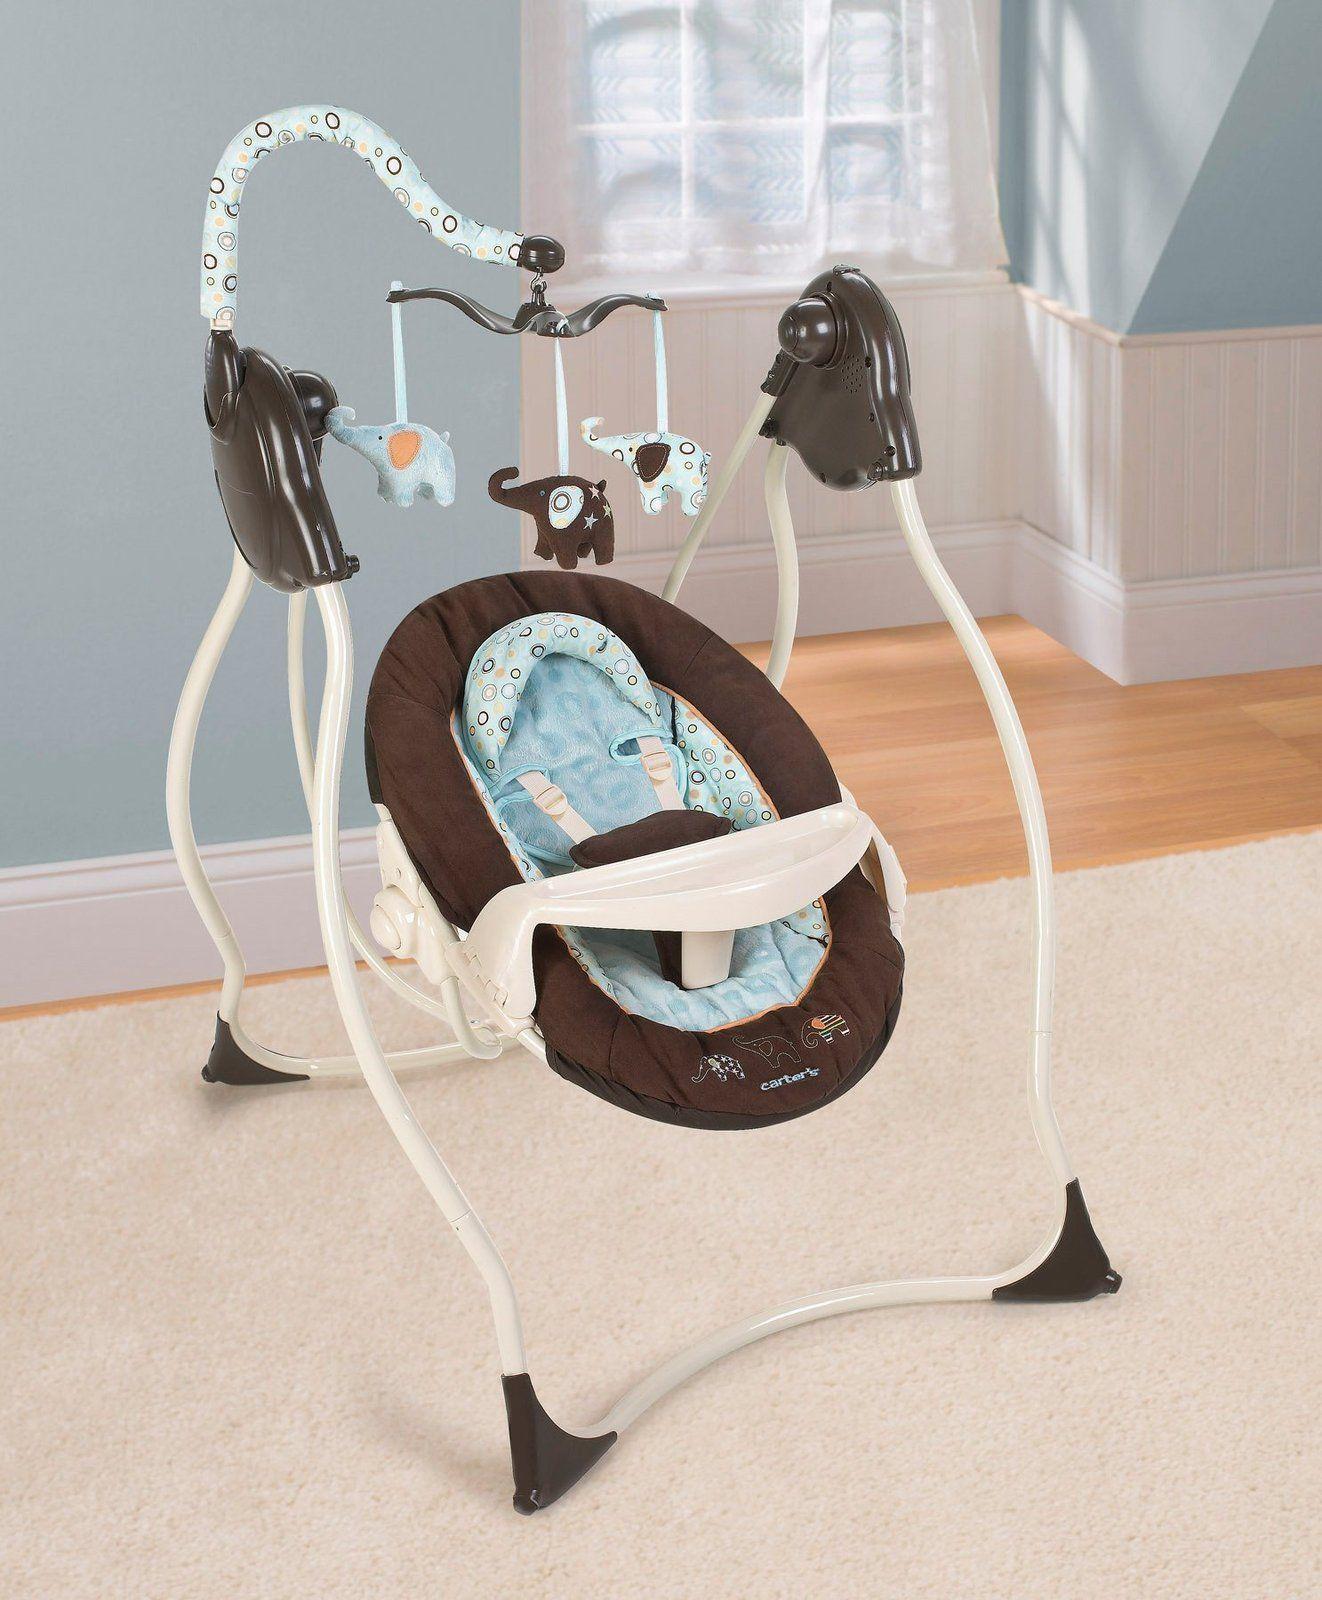 Carter S Cuddle Me Musical Swing Elephant Parade Elephant Baby Swing Baby Swings Baby Gallery